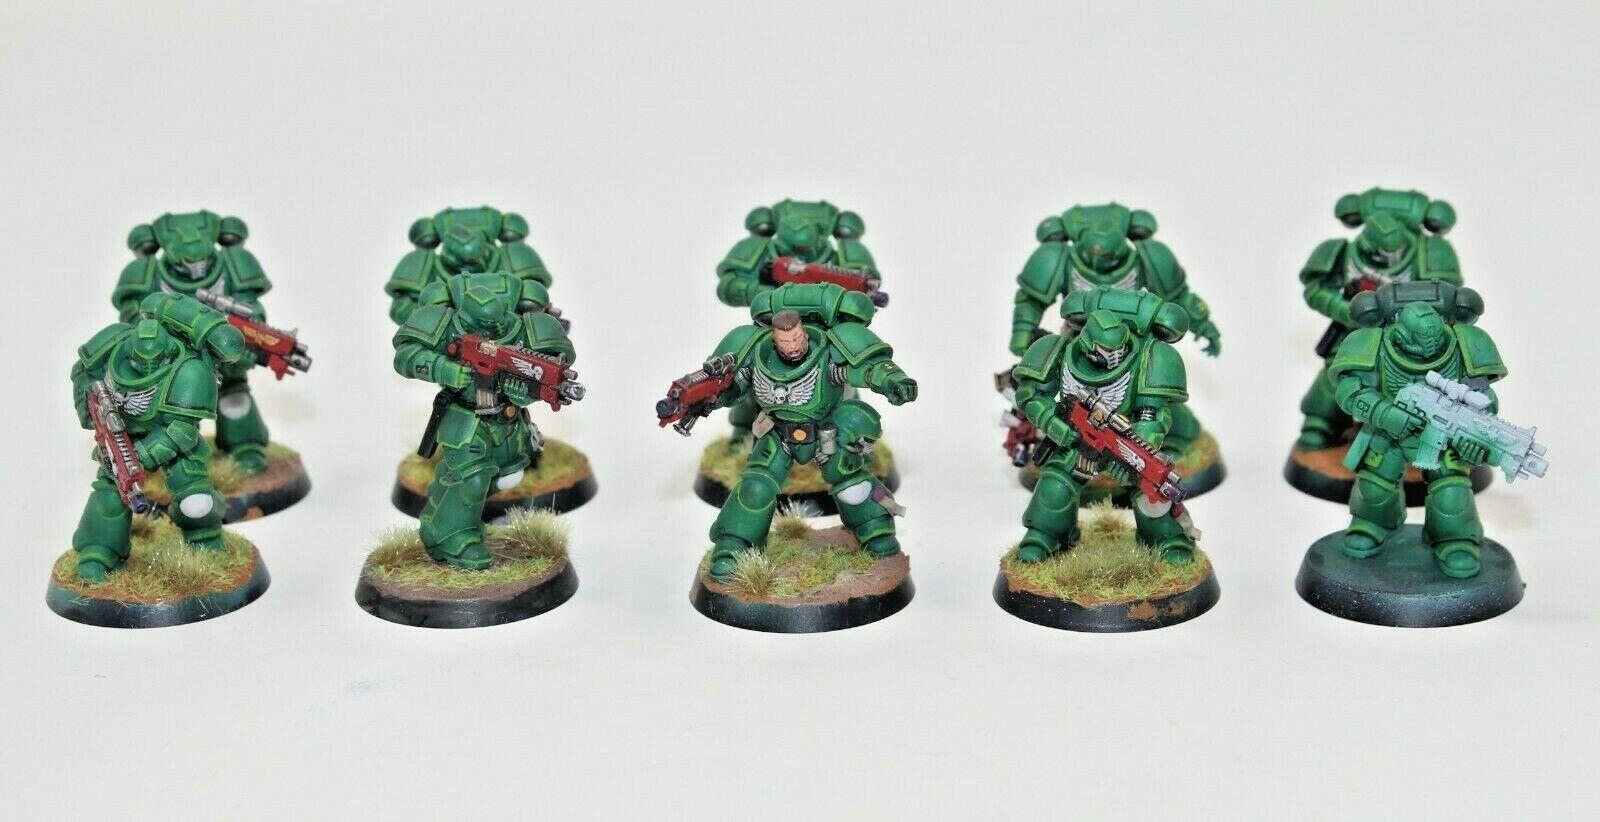 Warhammer spazio Marines Dark Angels  Intercessors Well Painted - JYS1  vendita online